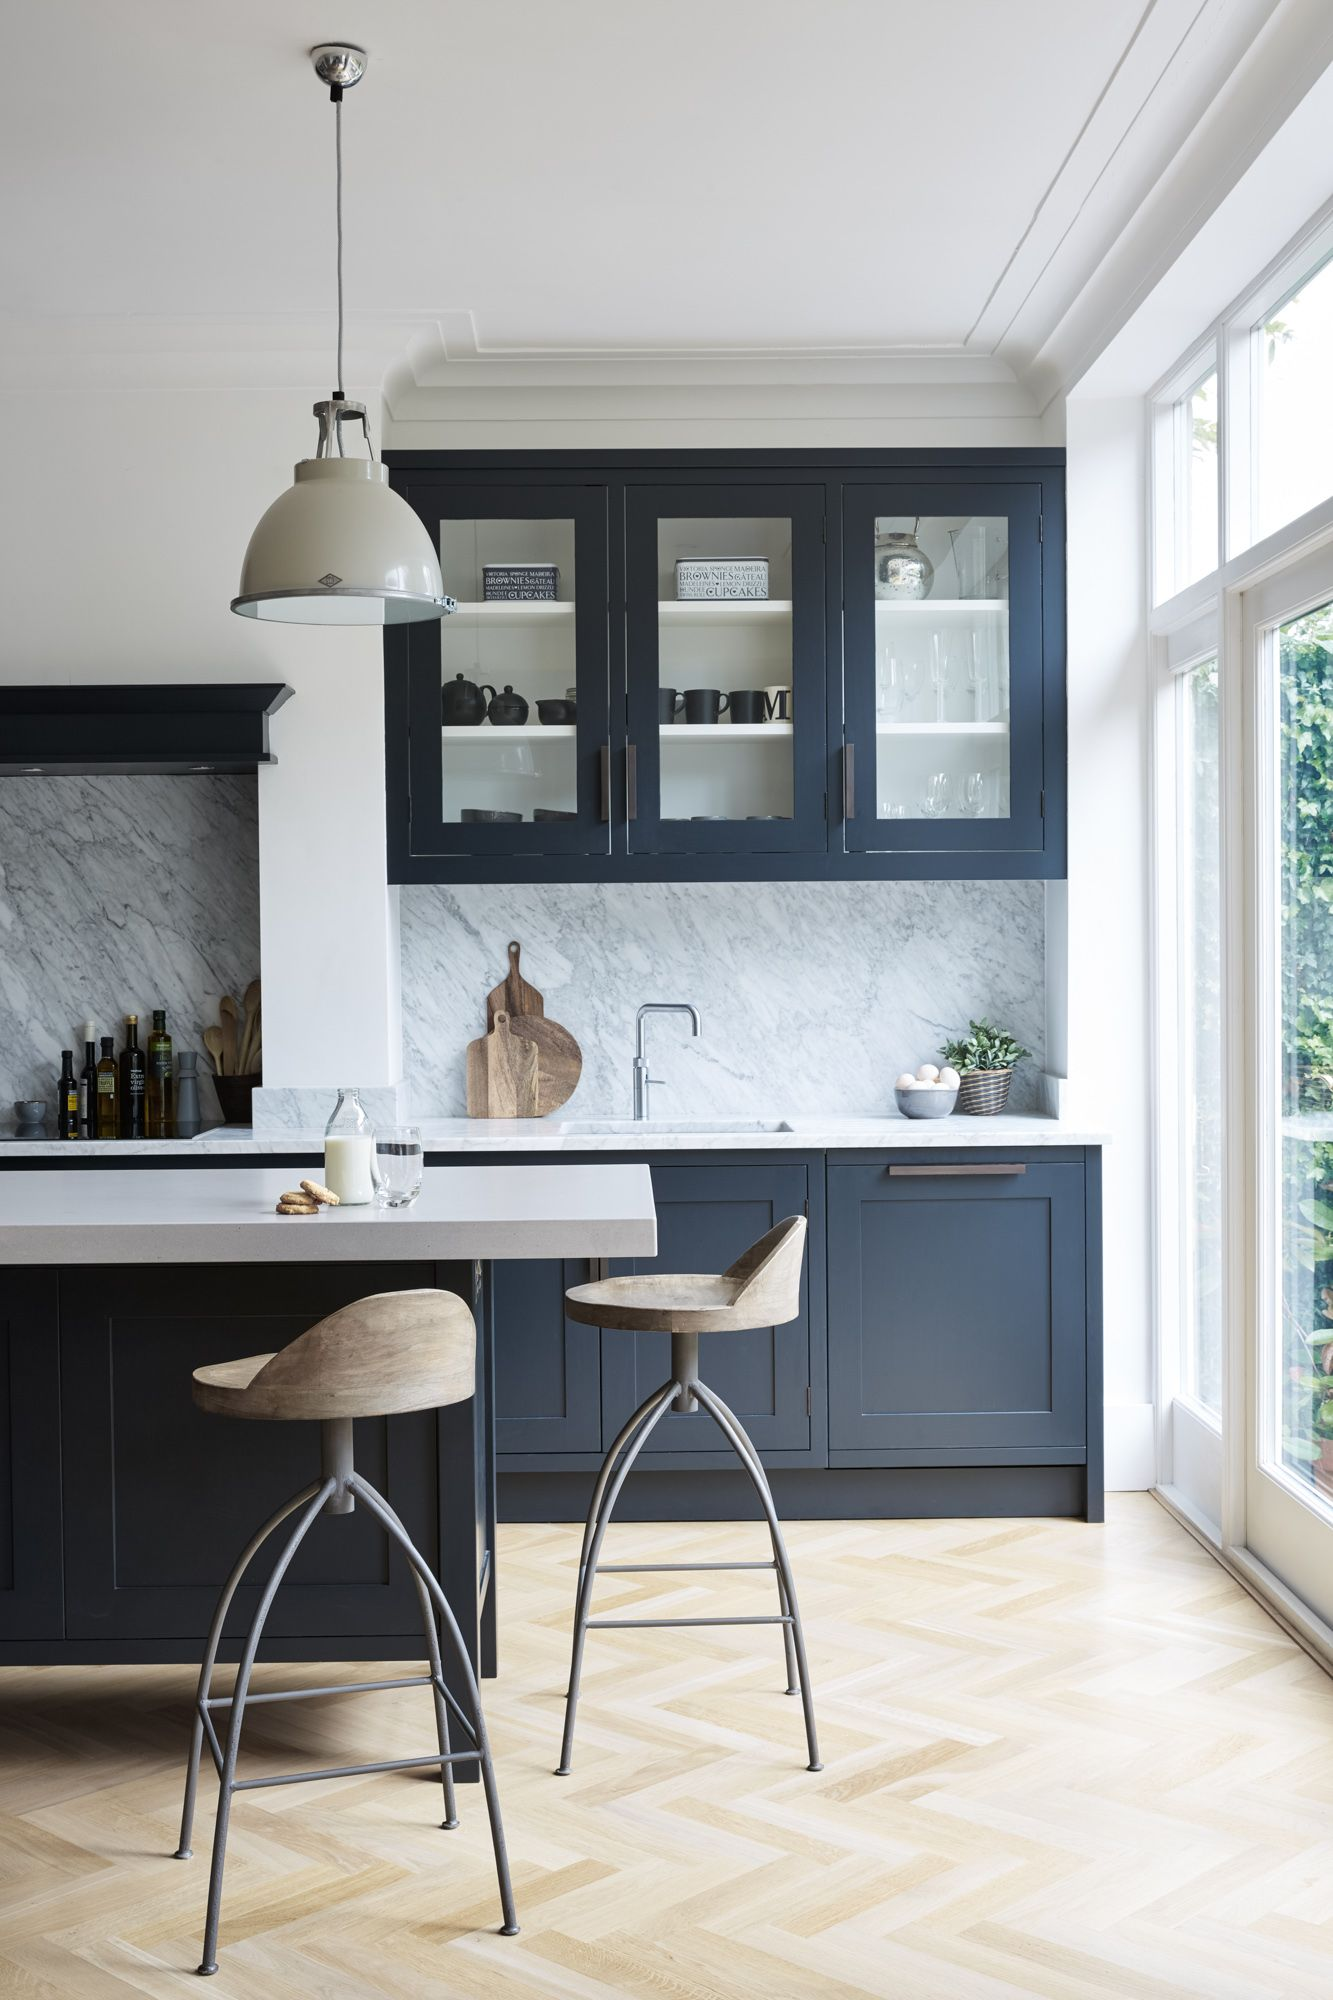 Virtuoso Kitchen By Mowlem Co Interior Design Kitchen Open Plan Kitchen Living Room Home Decor Kitchen